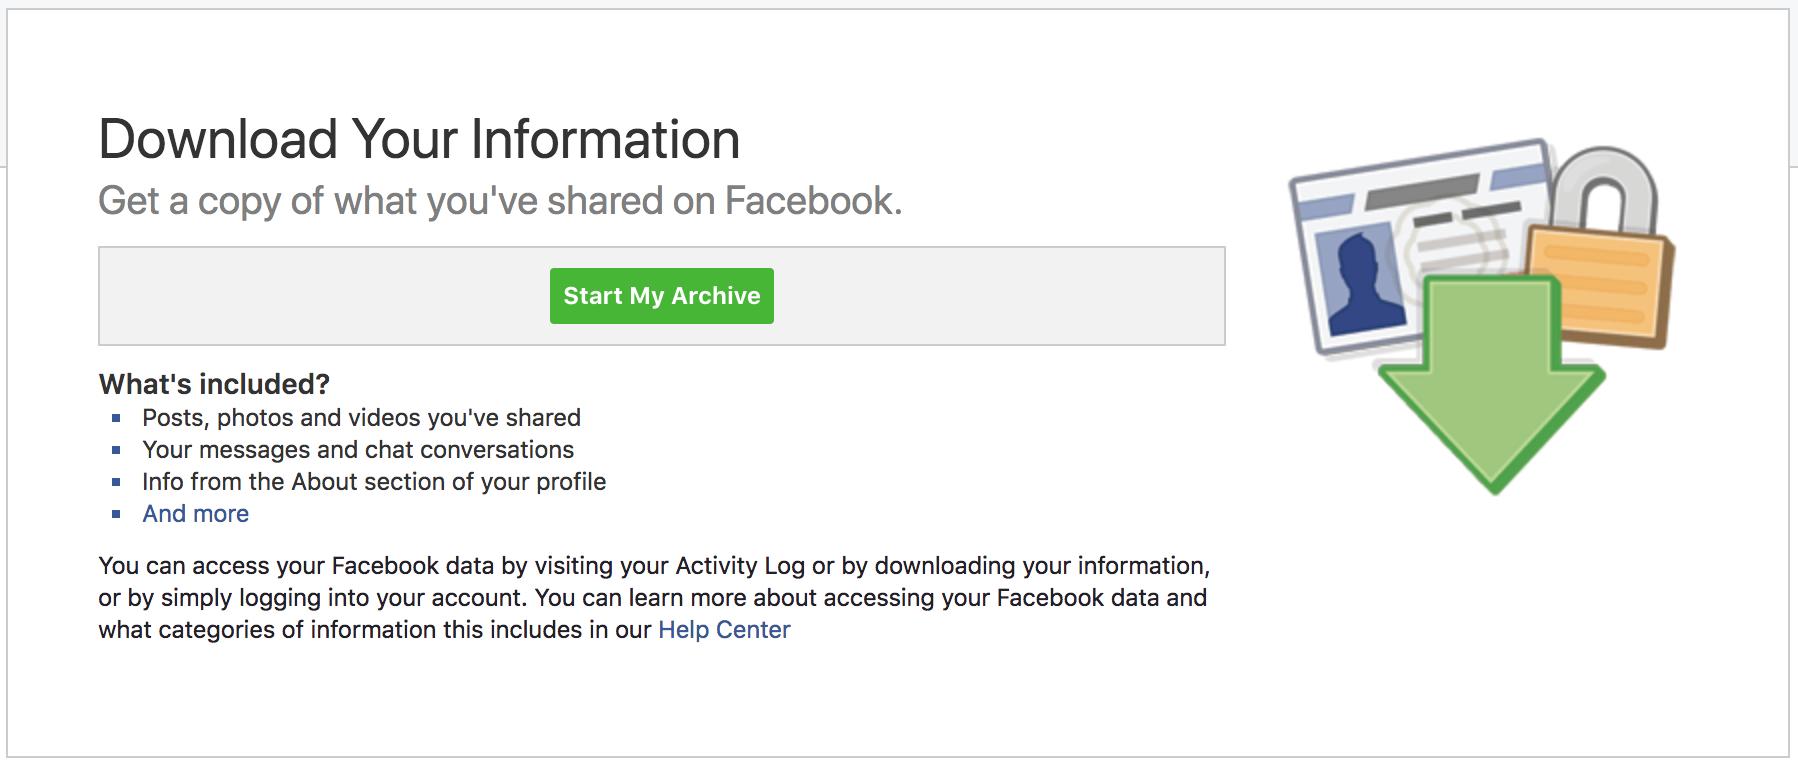 facebook information download box